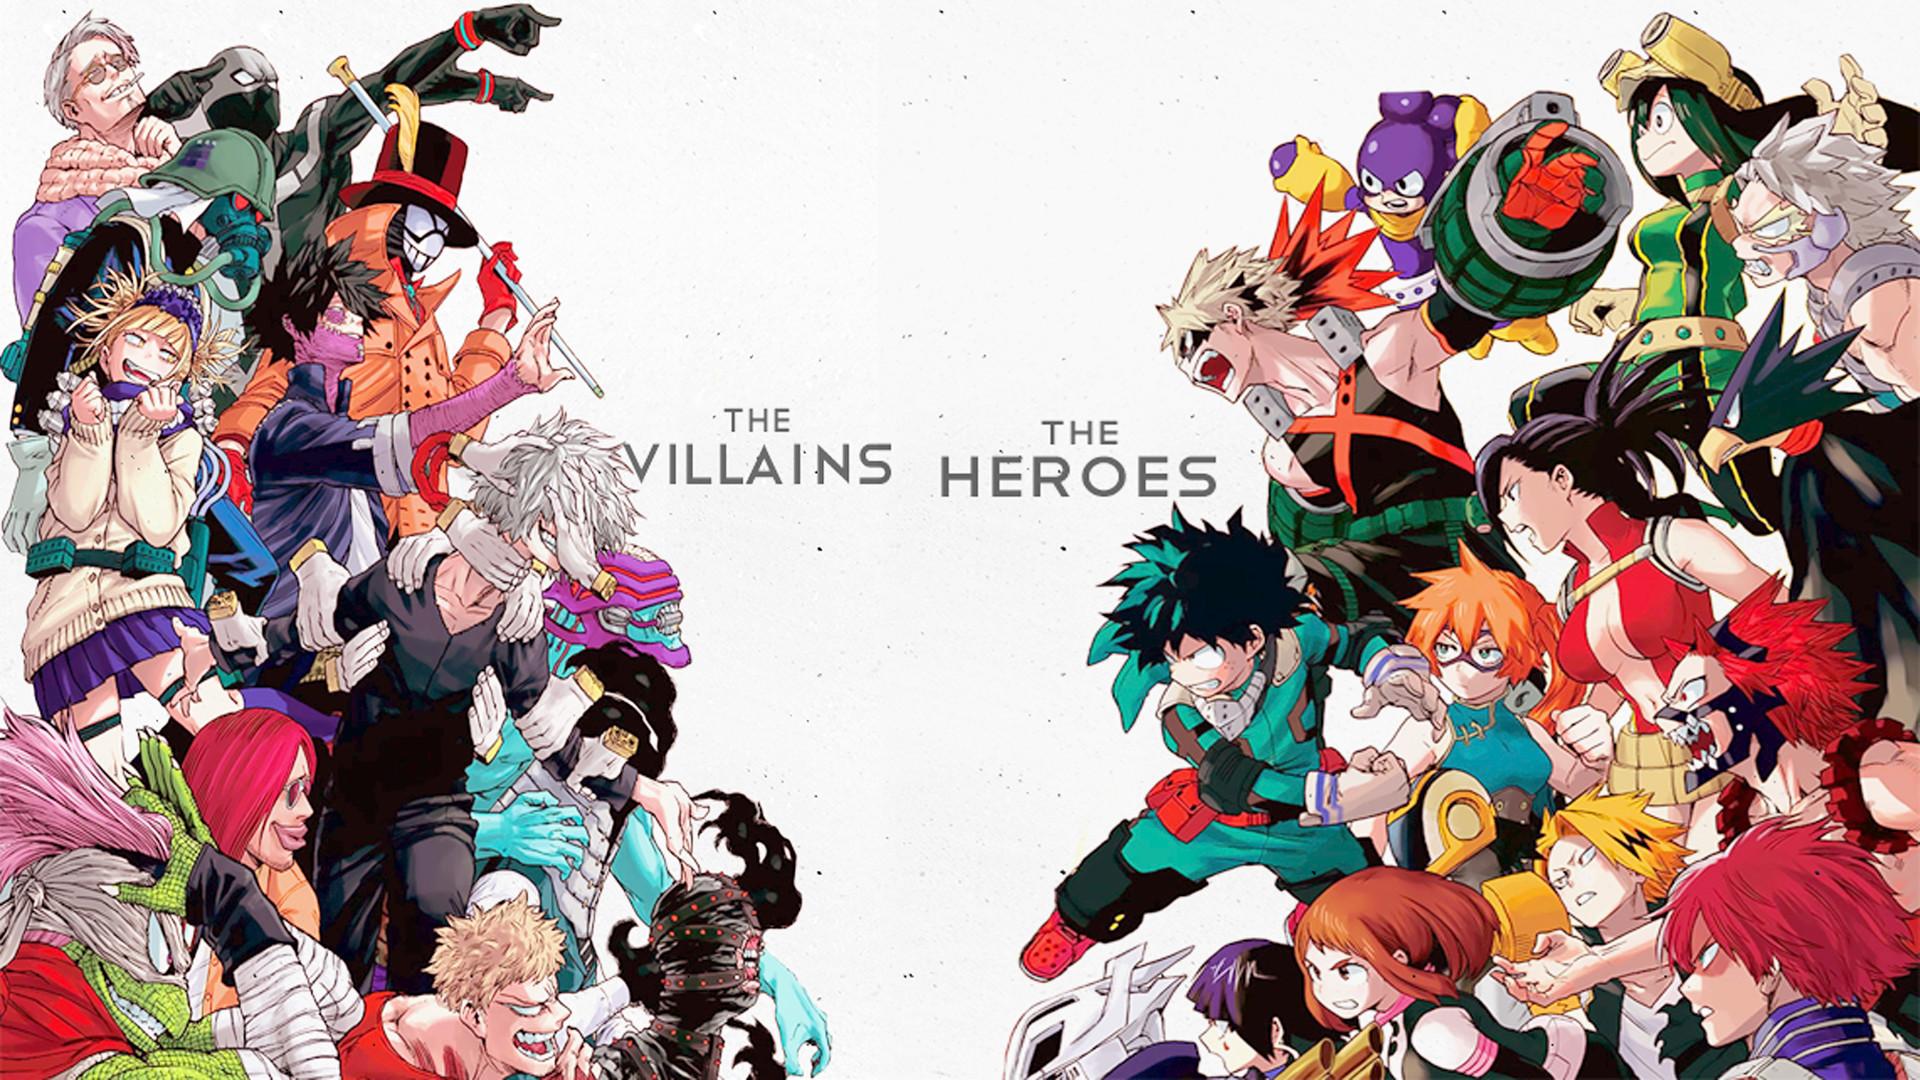 Boku No Hero Wallpapers 68 Images